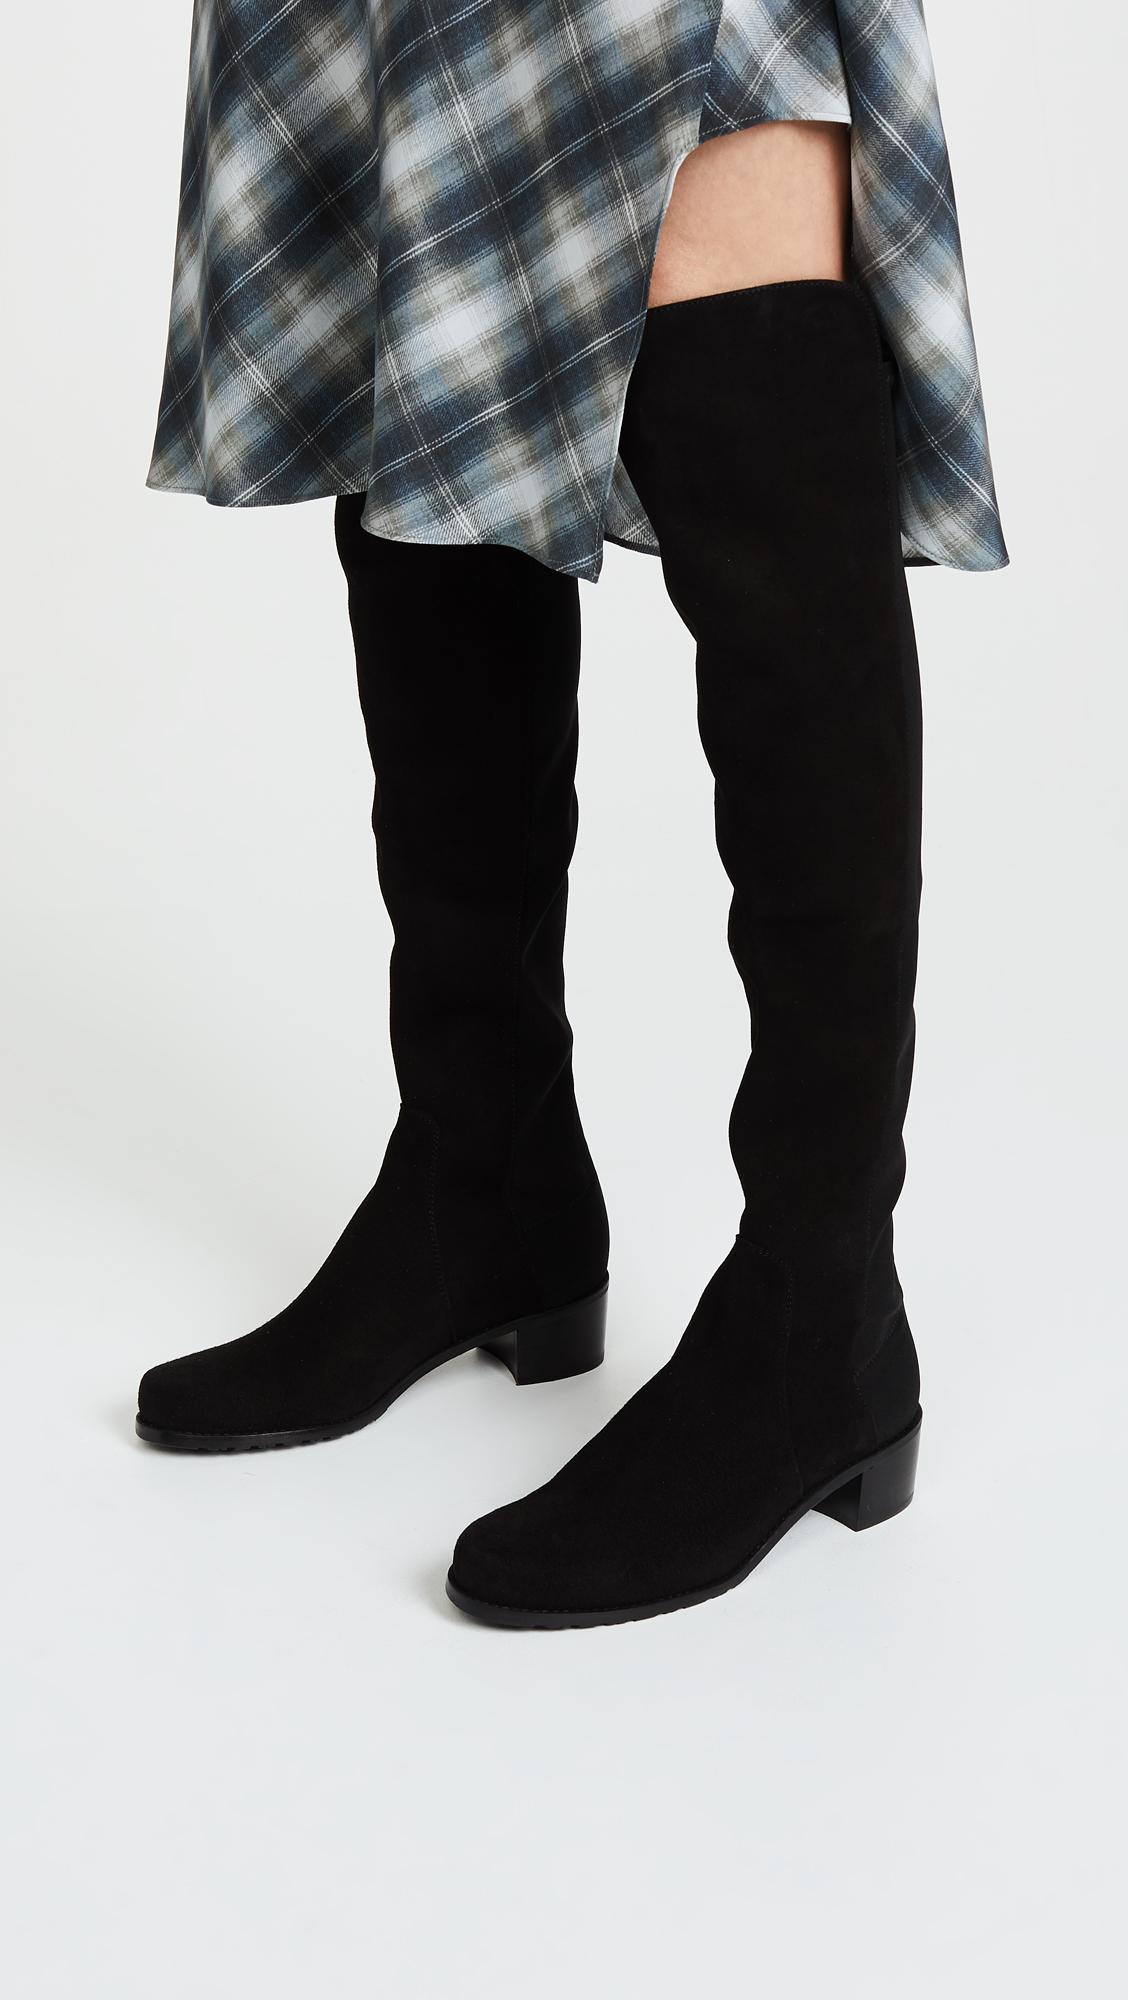 67bcadcd0d8 Stuart Weitzman Reserve Stretch Suede Boots